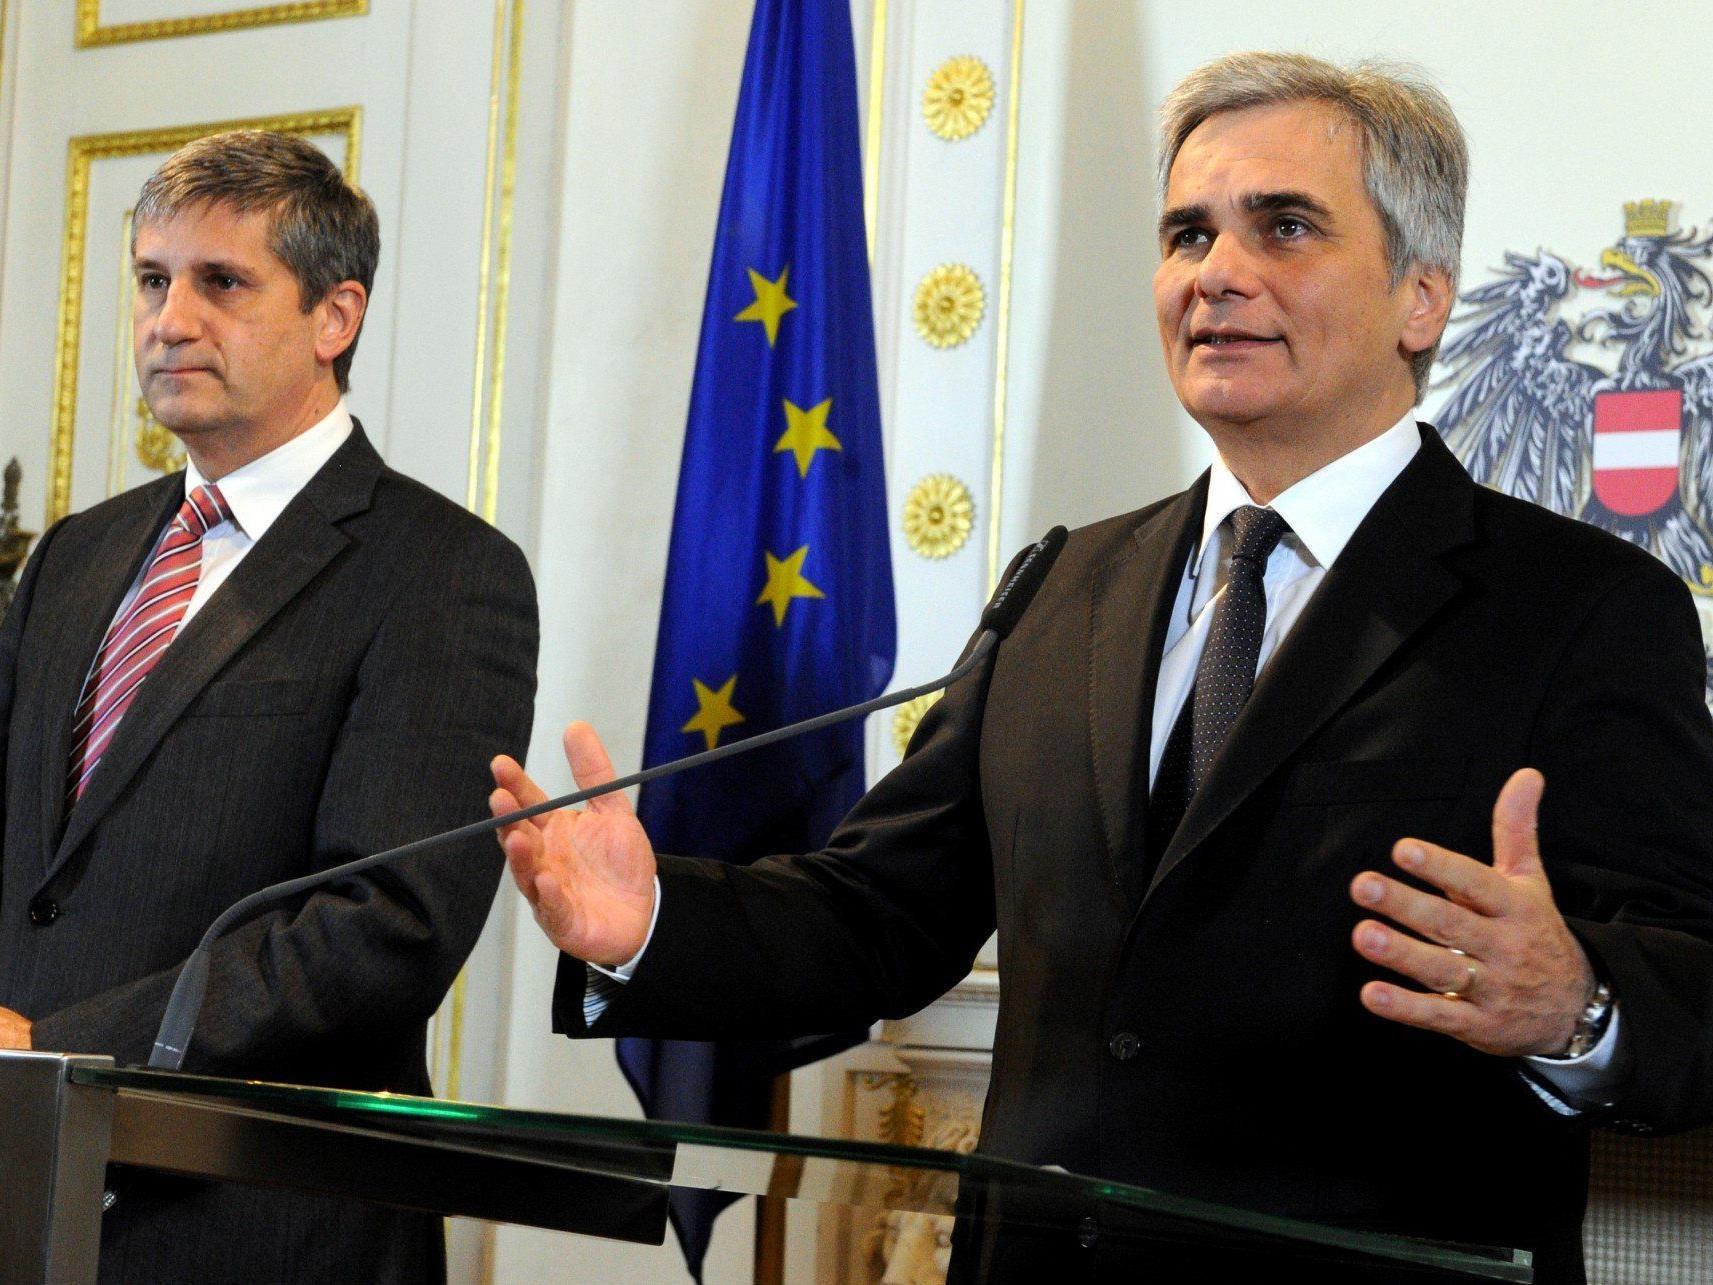 Auch Koalitionspartner ÖVP sei verhandlungsbereit.